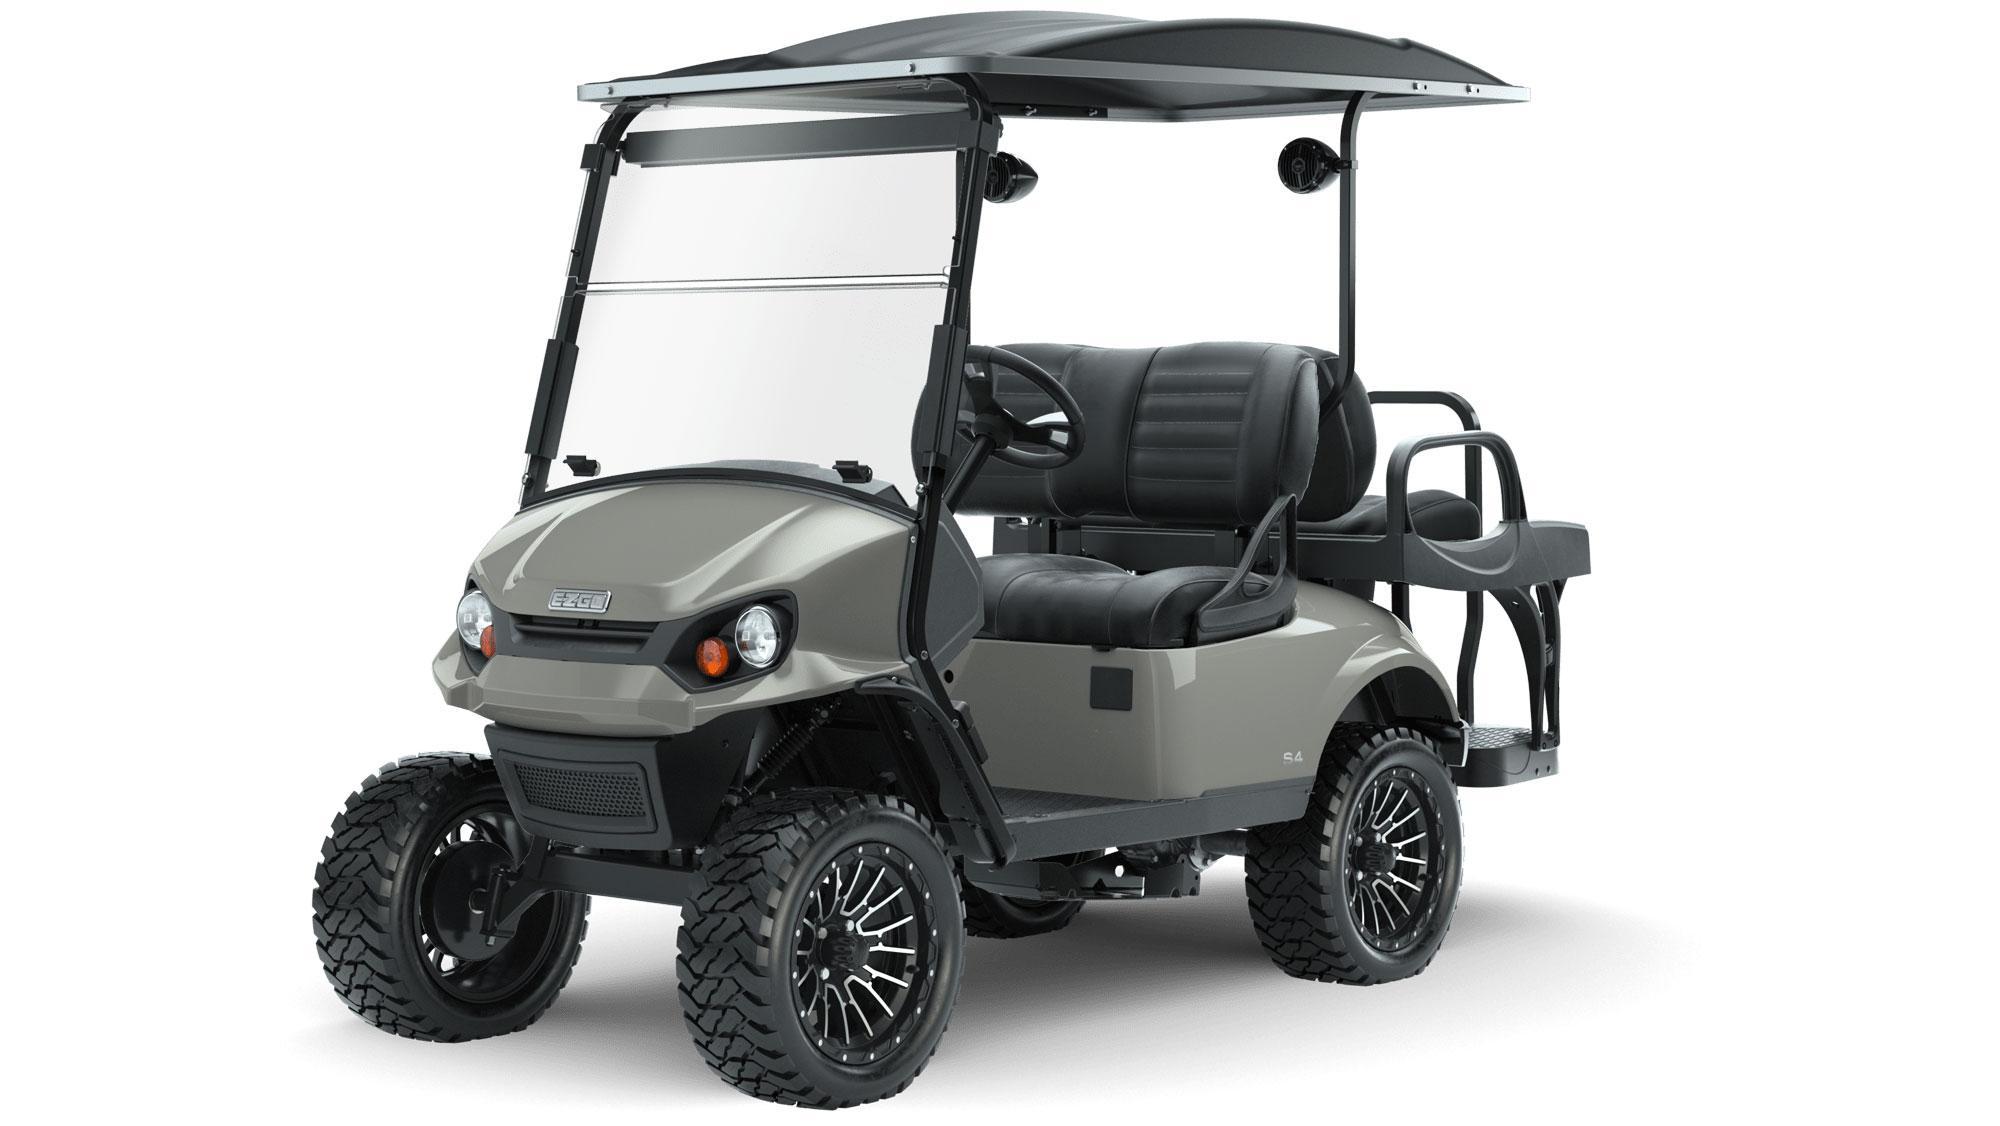 EZGO Express S4 with Premium Seats Accessories